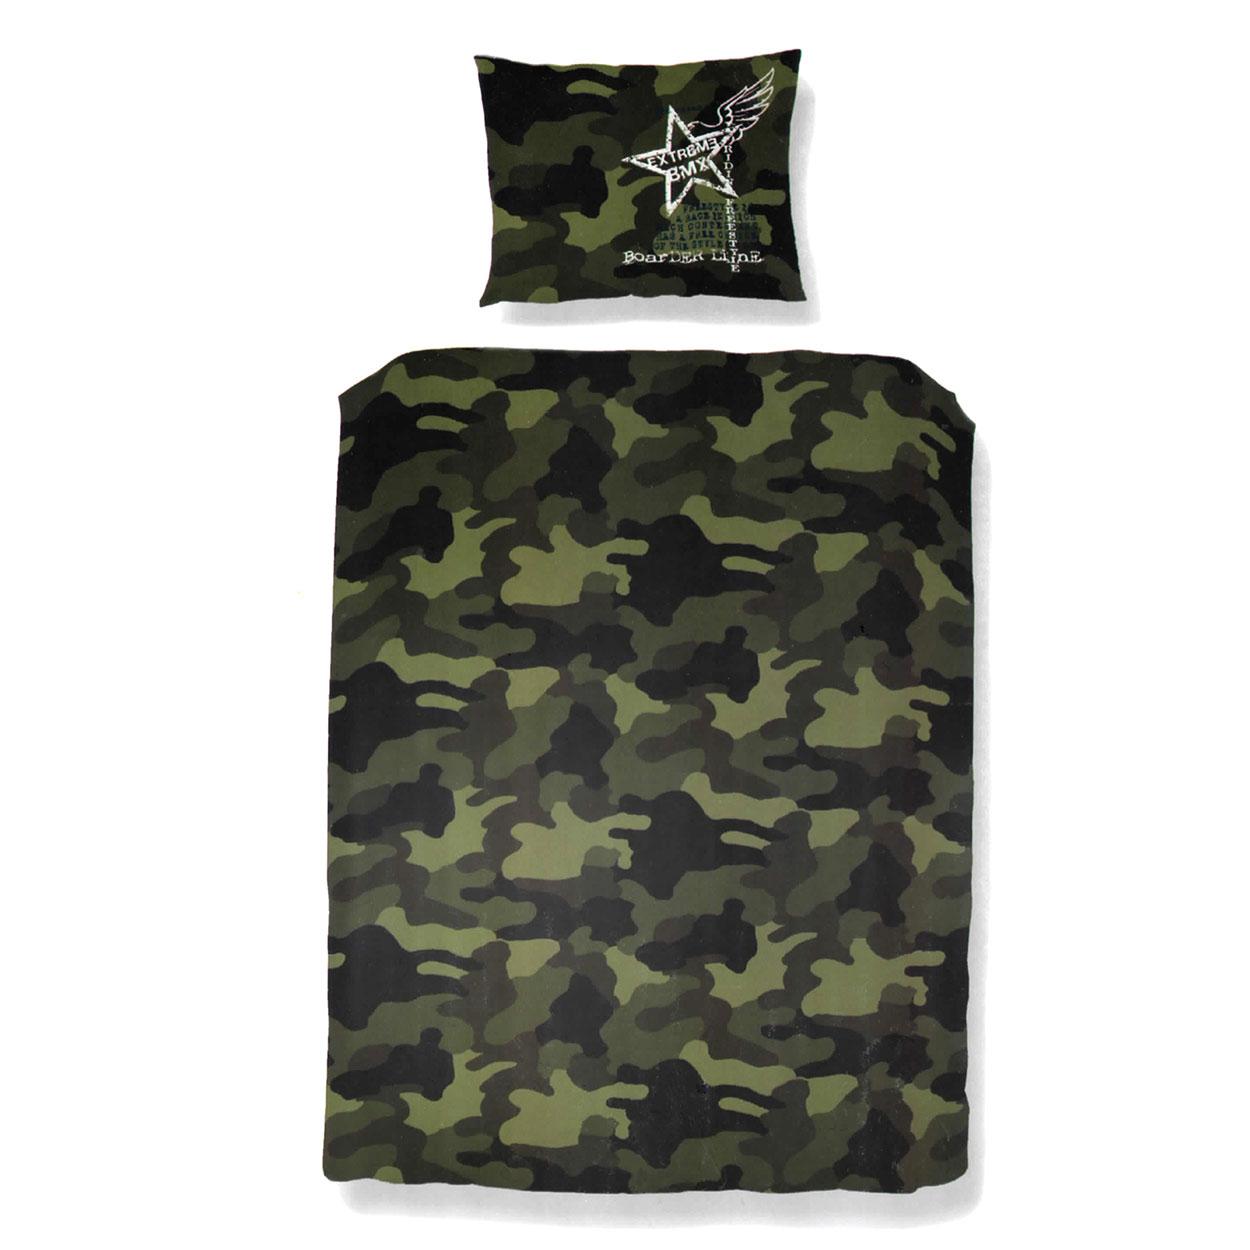 Dekbedovertrek Jungle Camouflage online kopen : Lobbes.nl